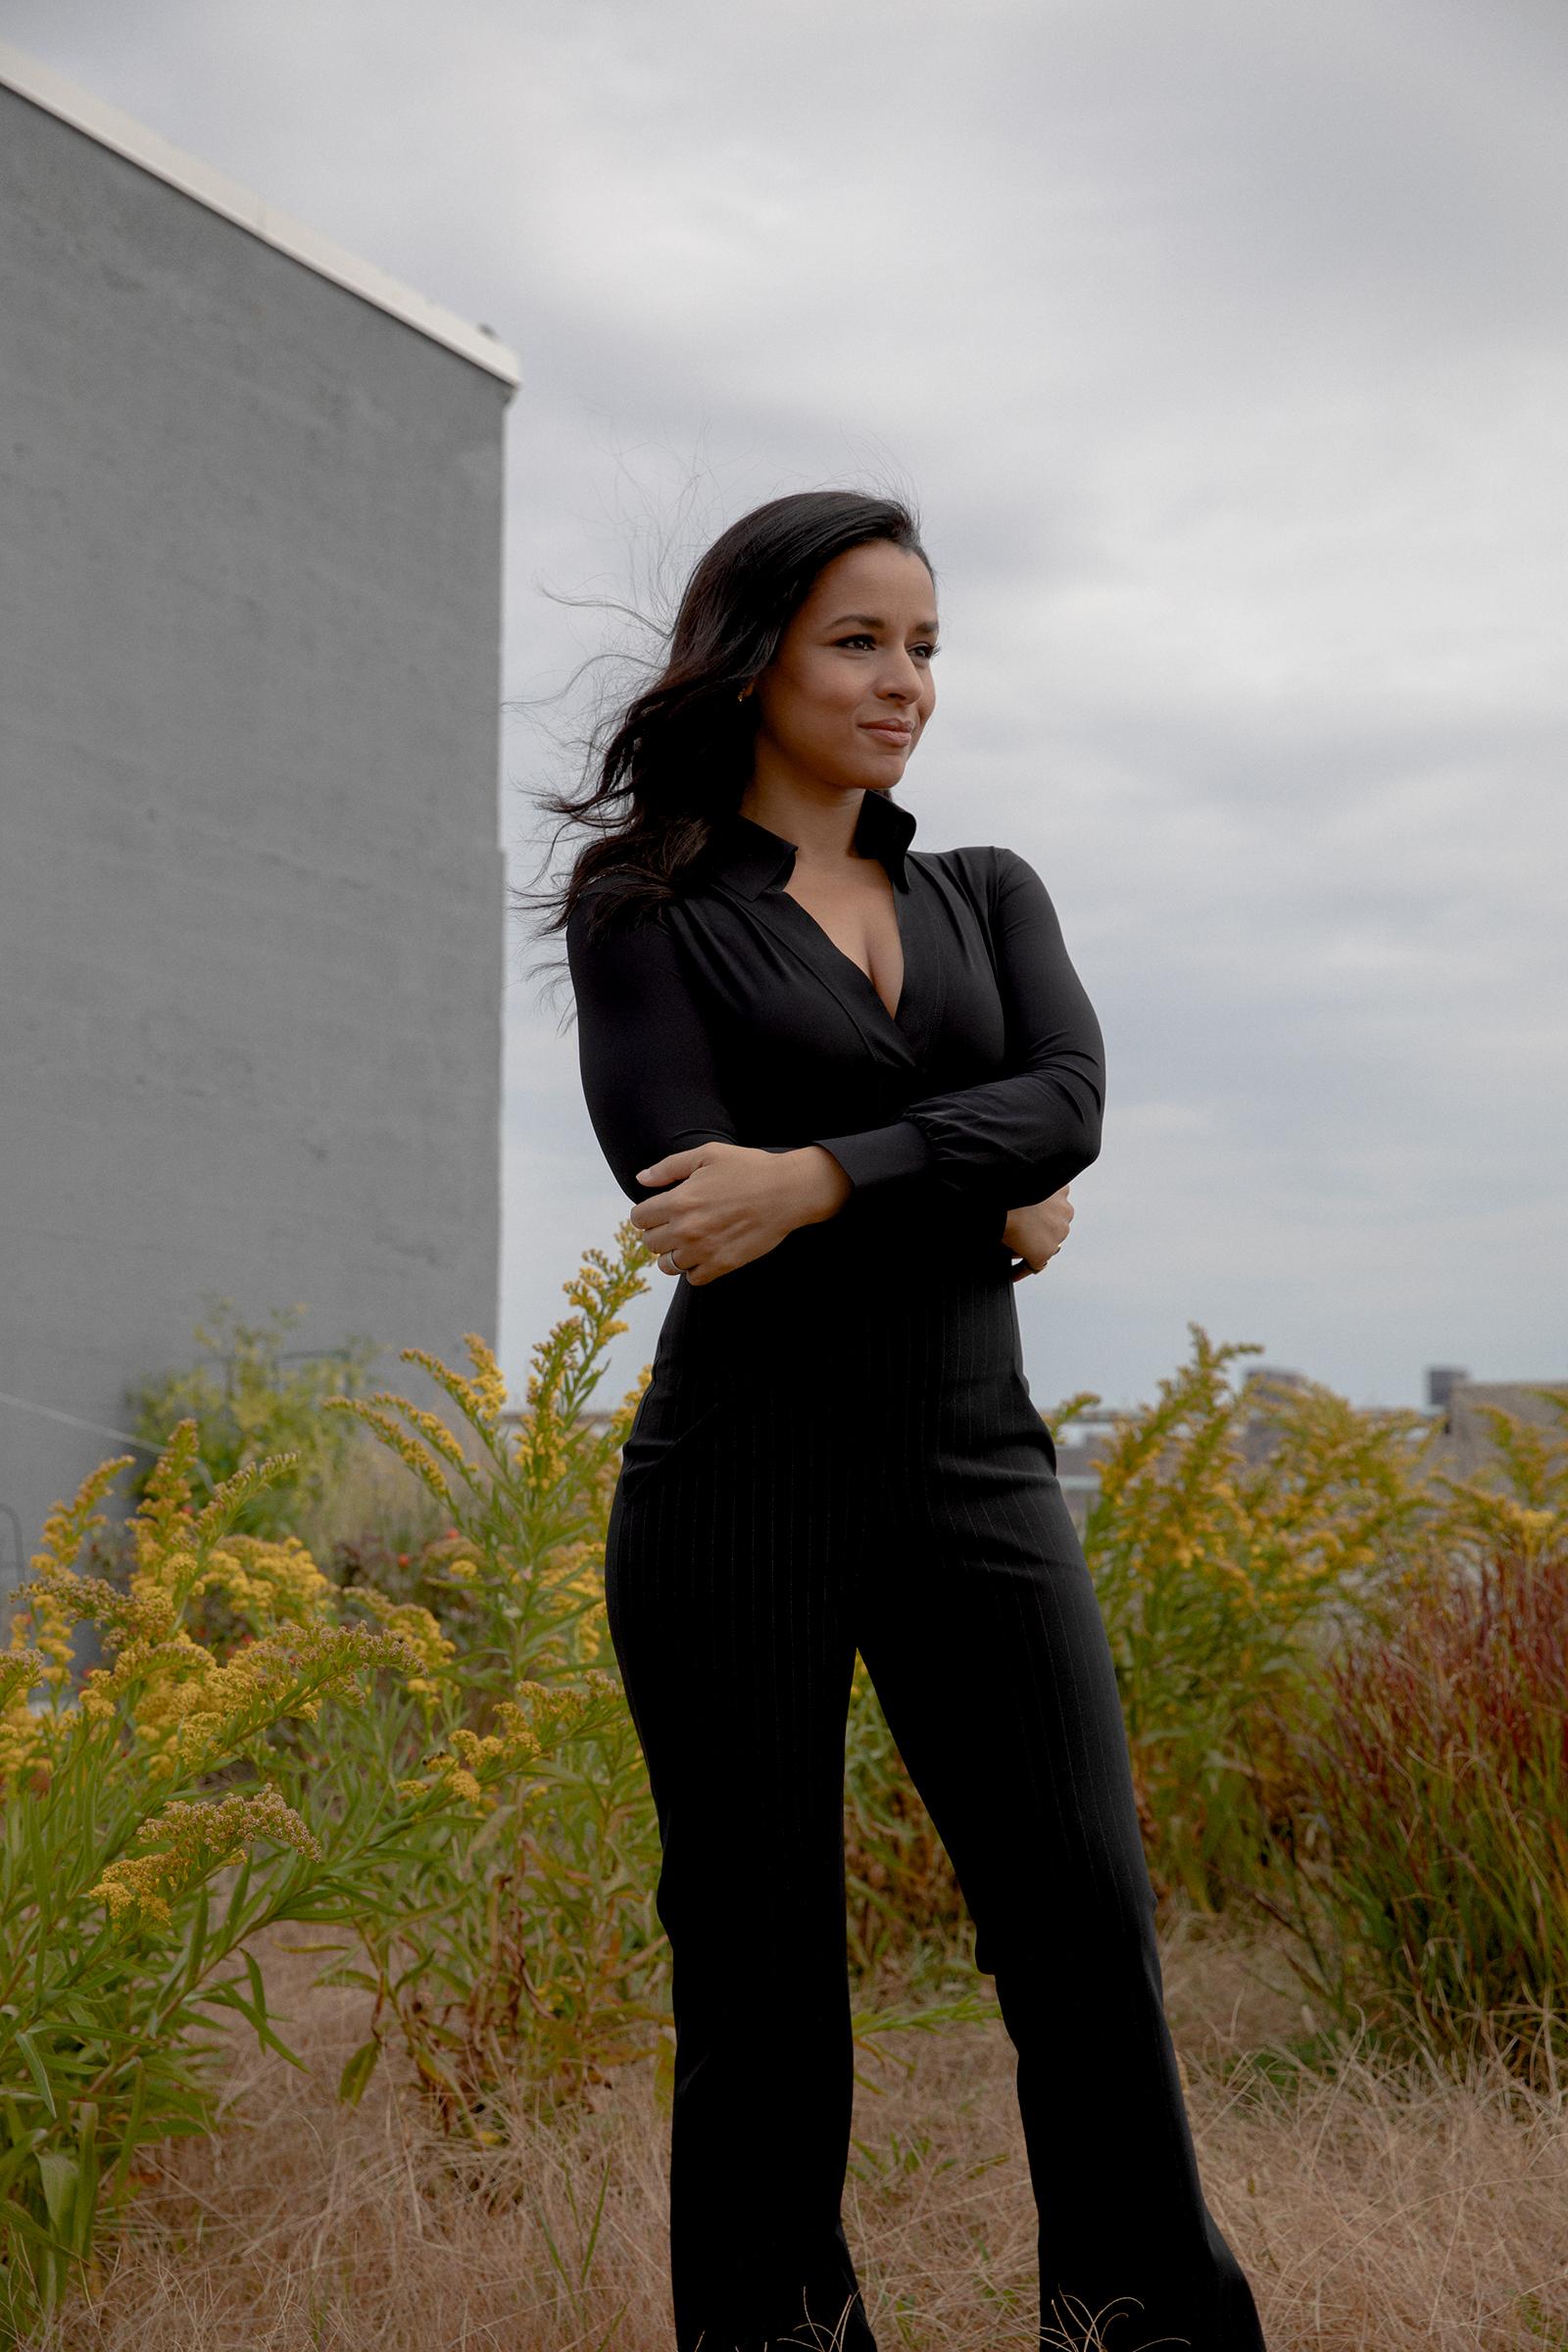 Sarah Cooper in Brooklyn on Oct. 11